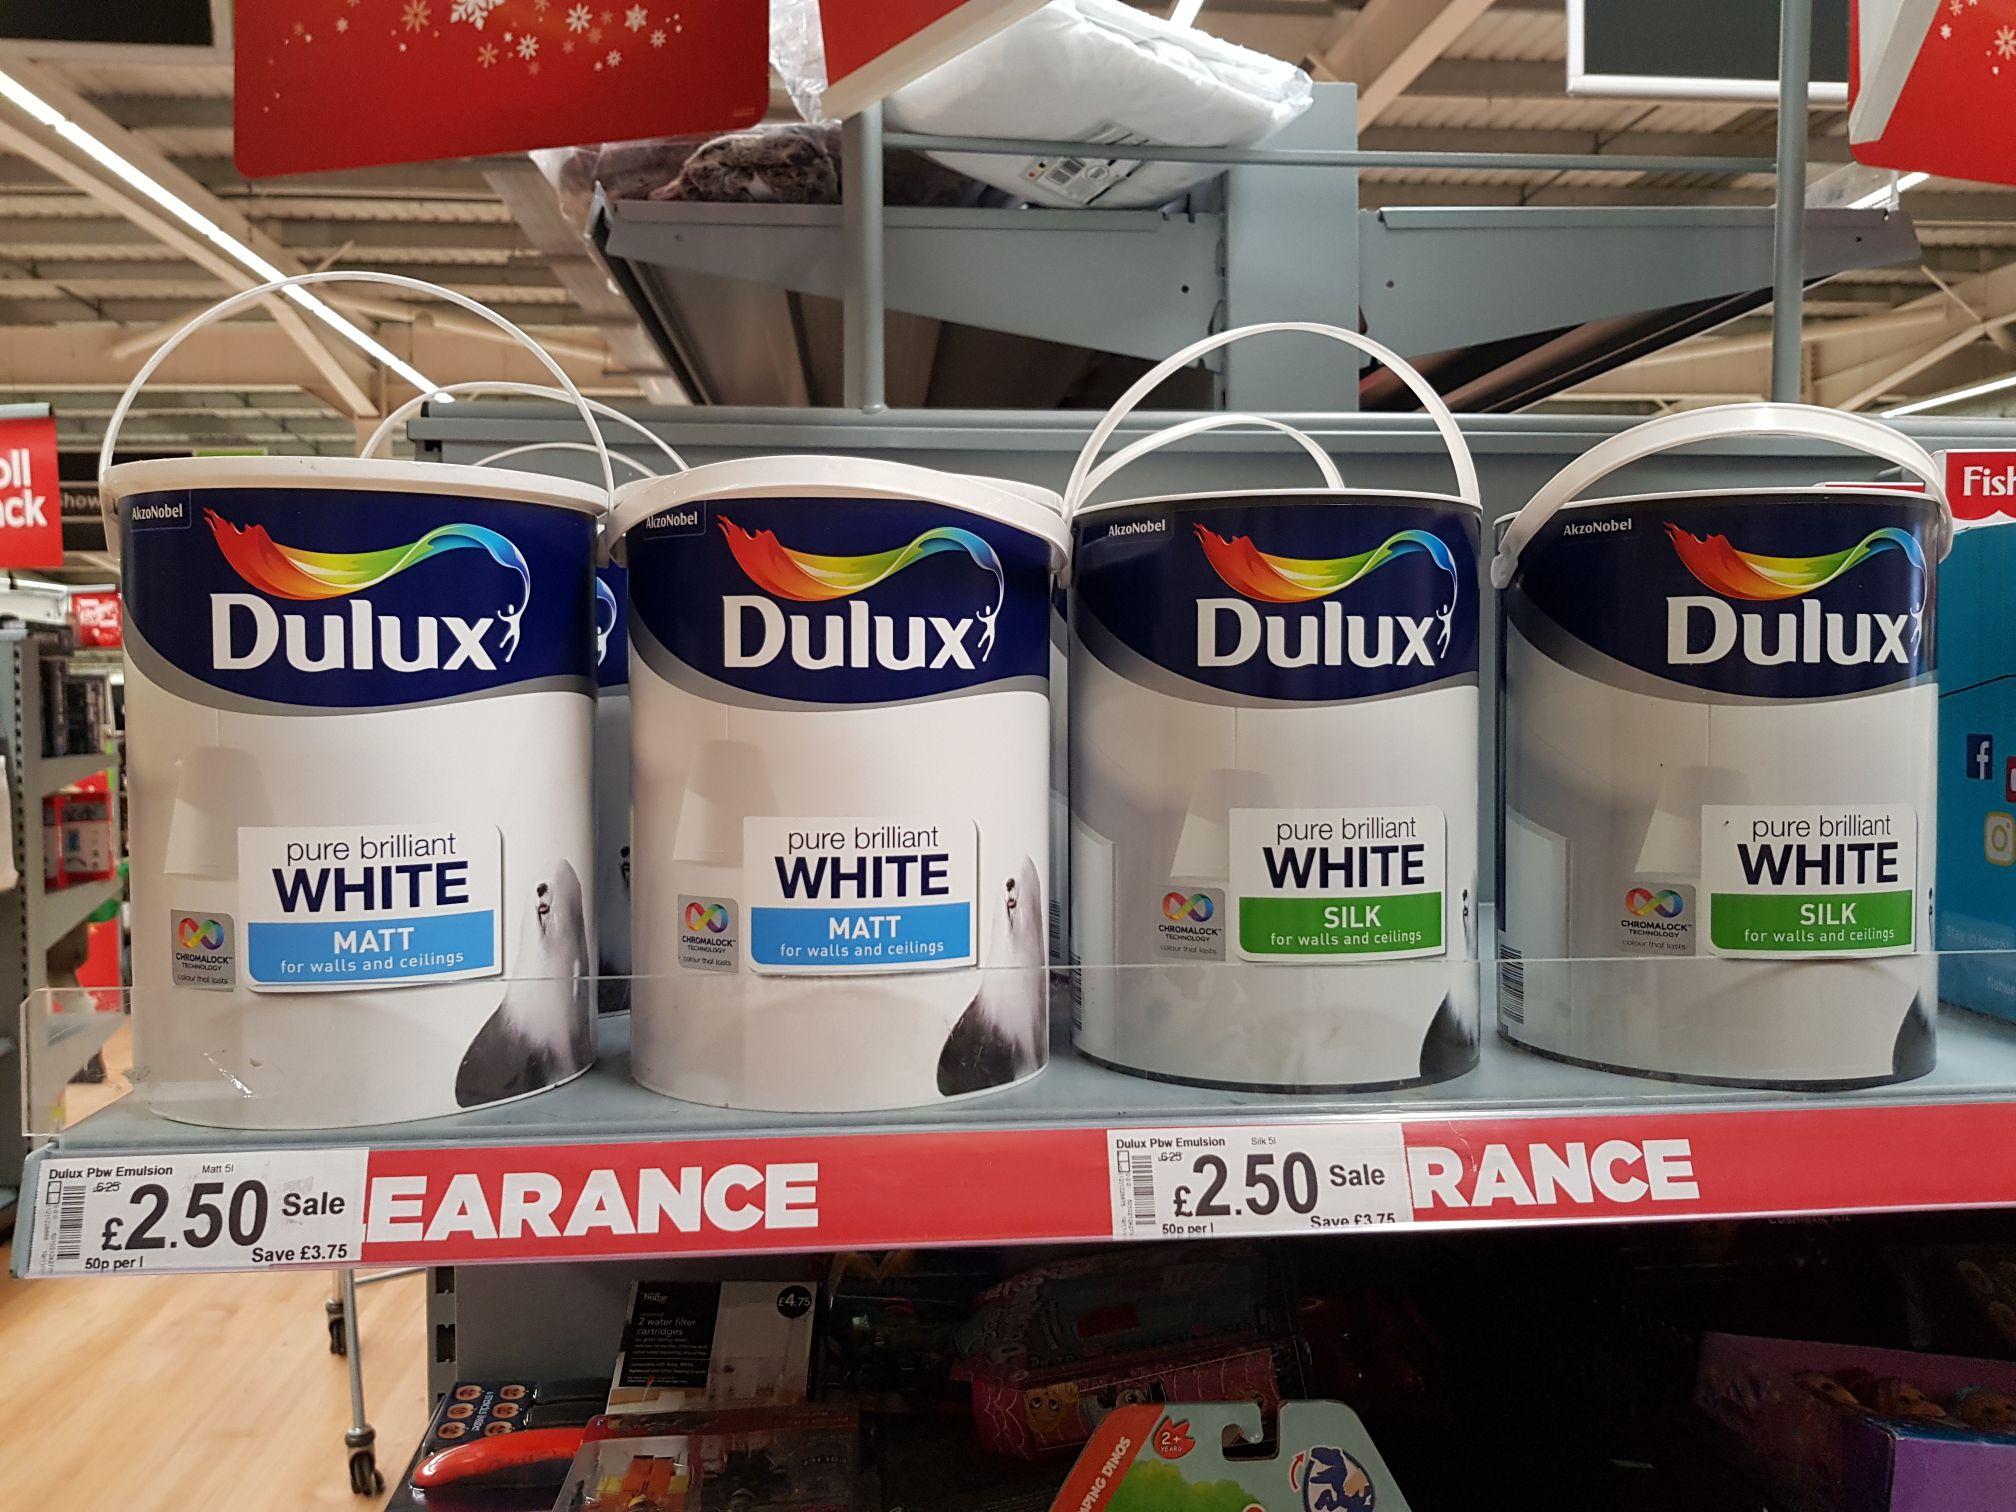 5L Dulux white paint!! Matt and silk 2.50 instore @ ASDA